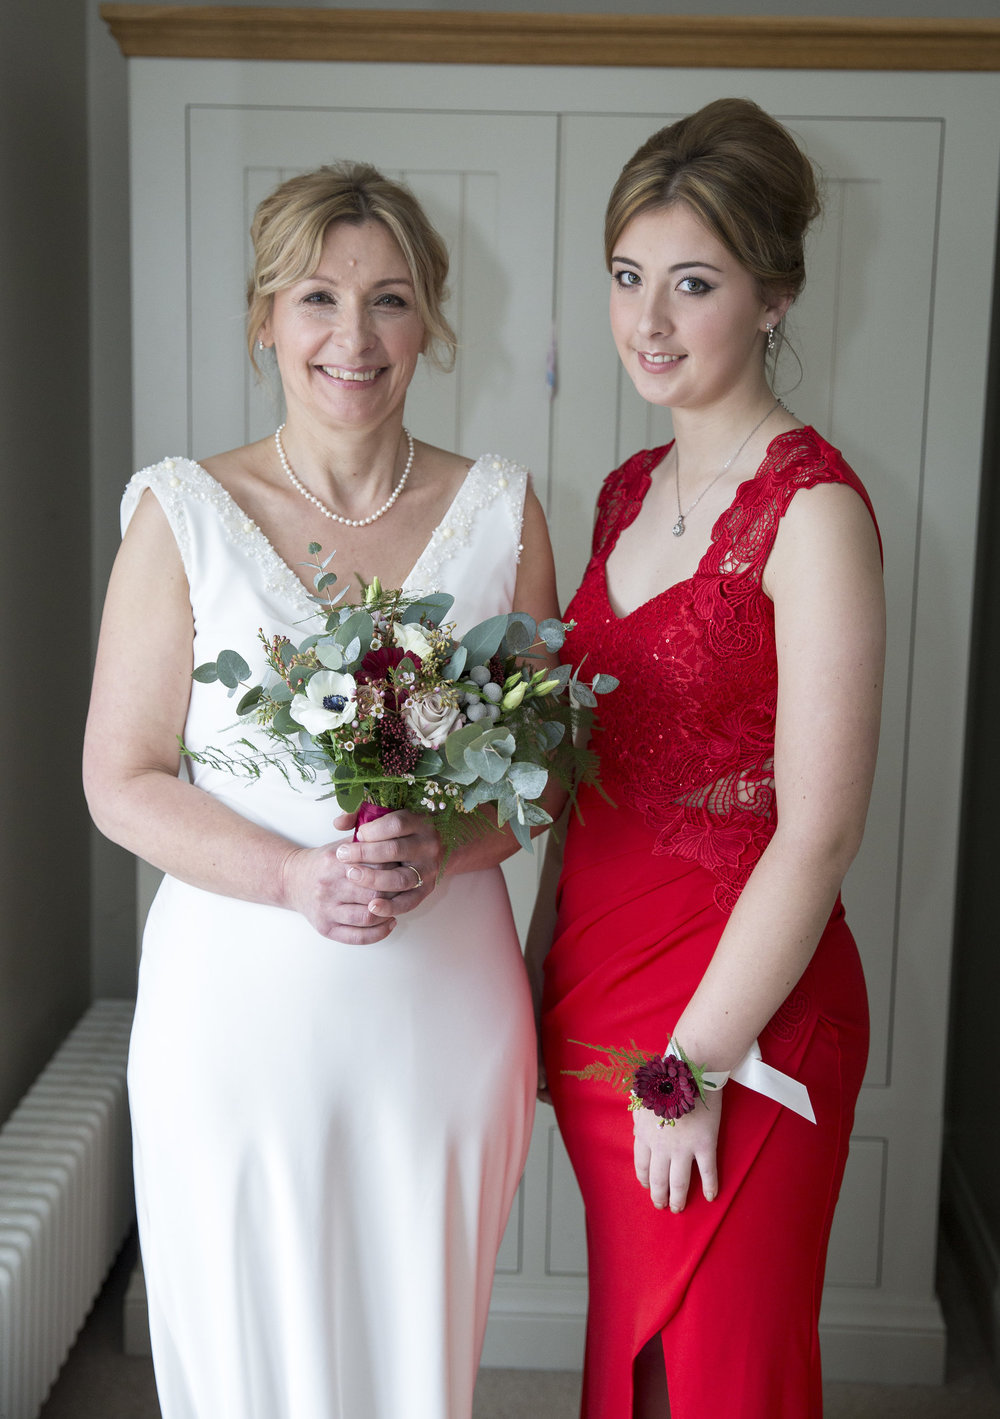 Miranda+bouquet.jpg